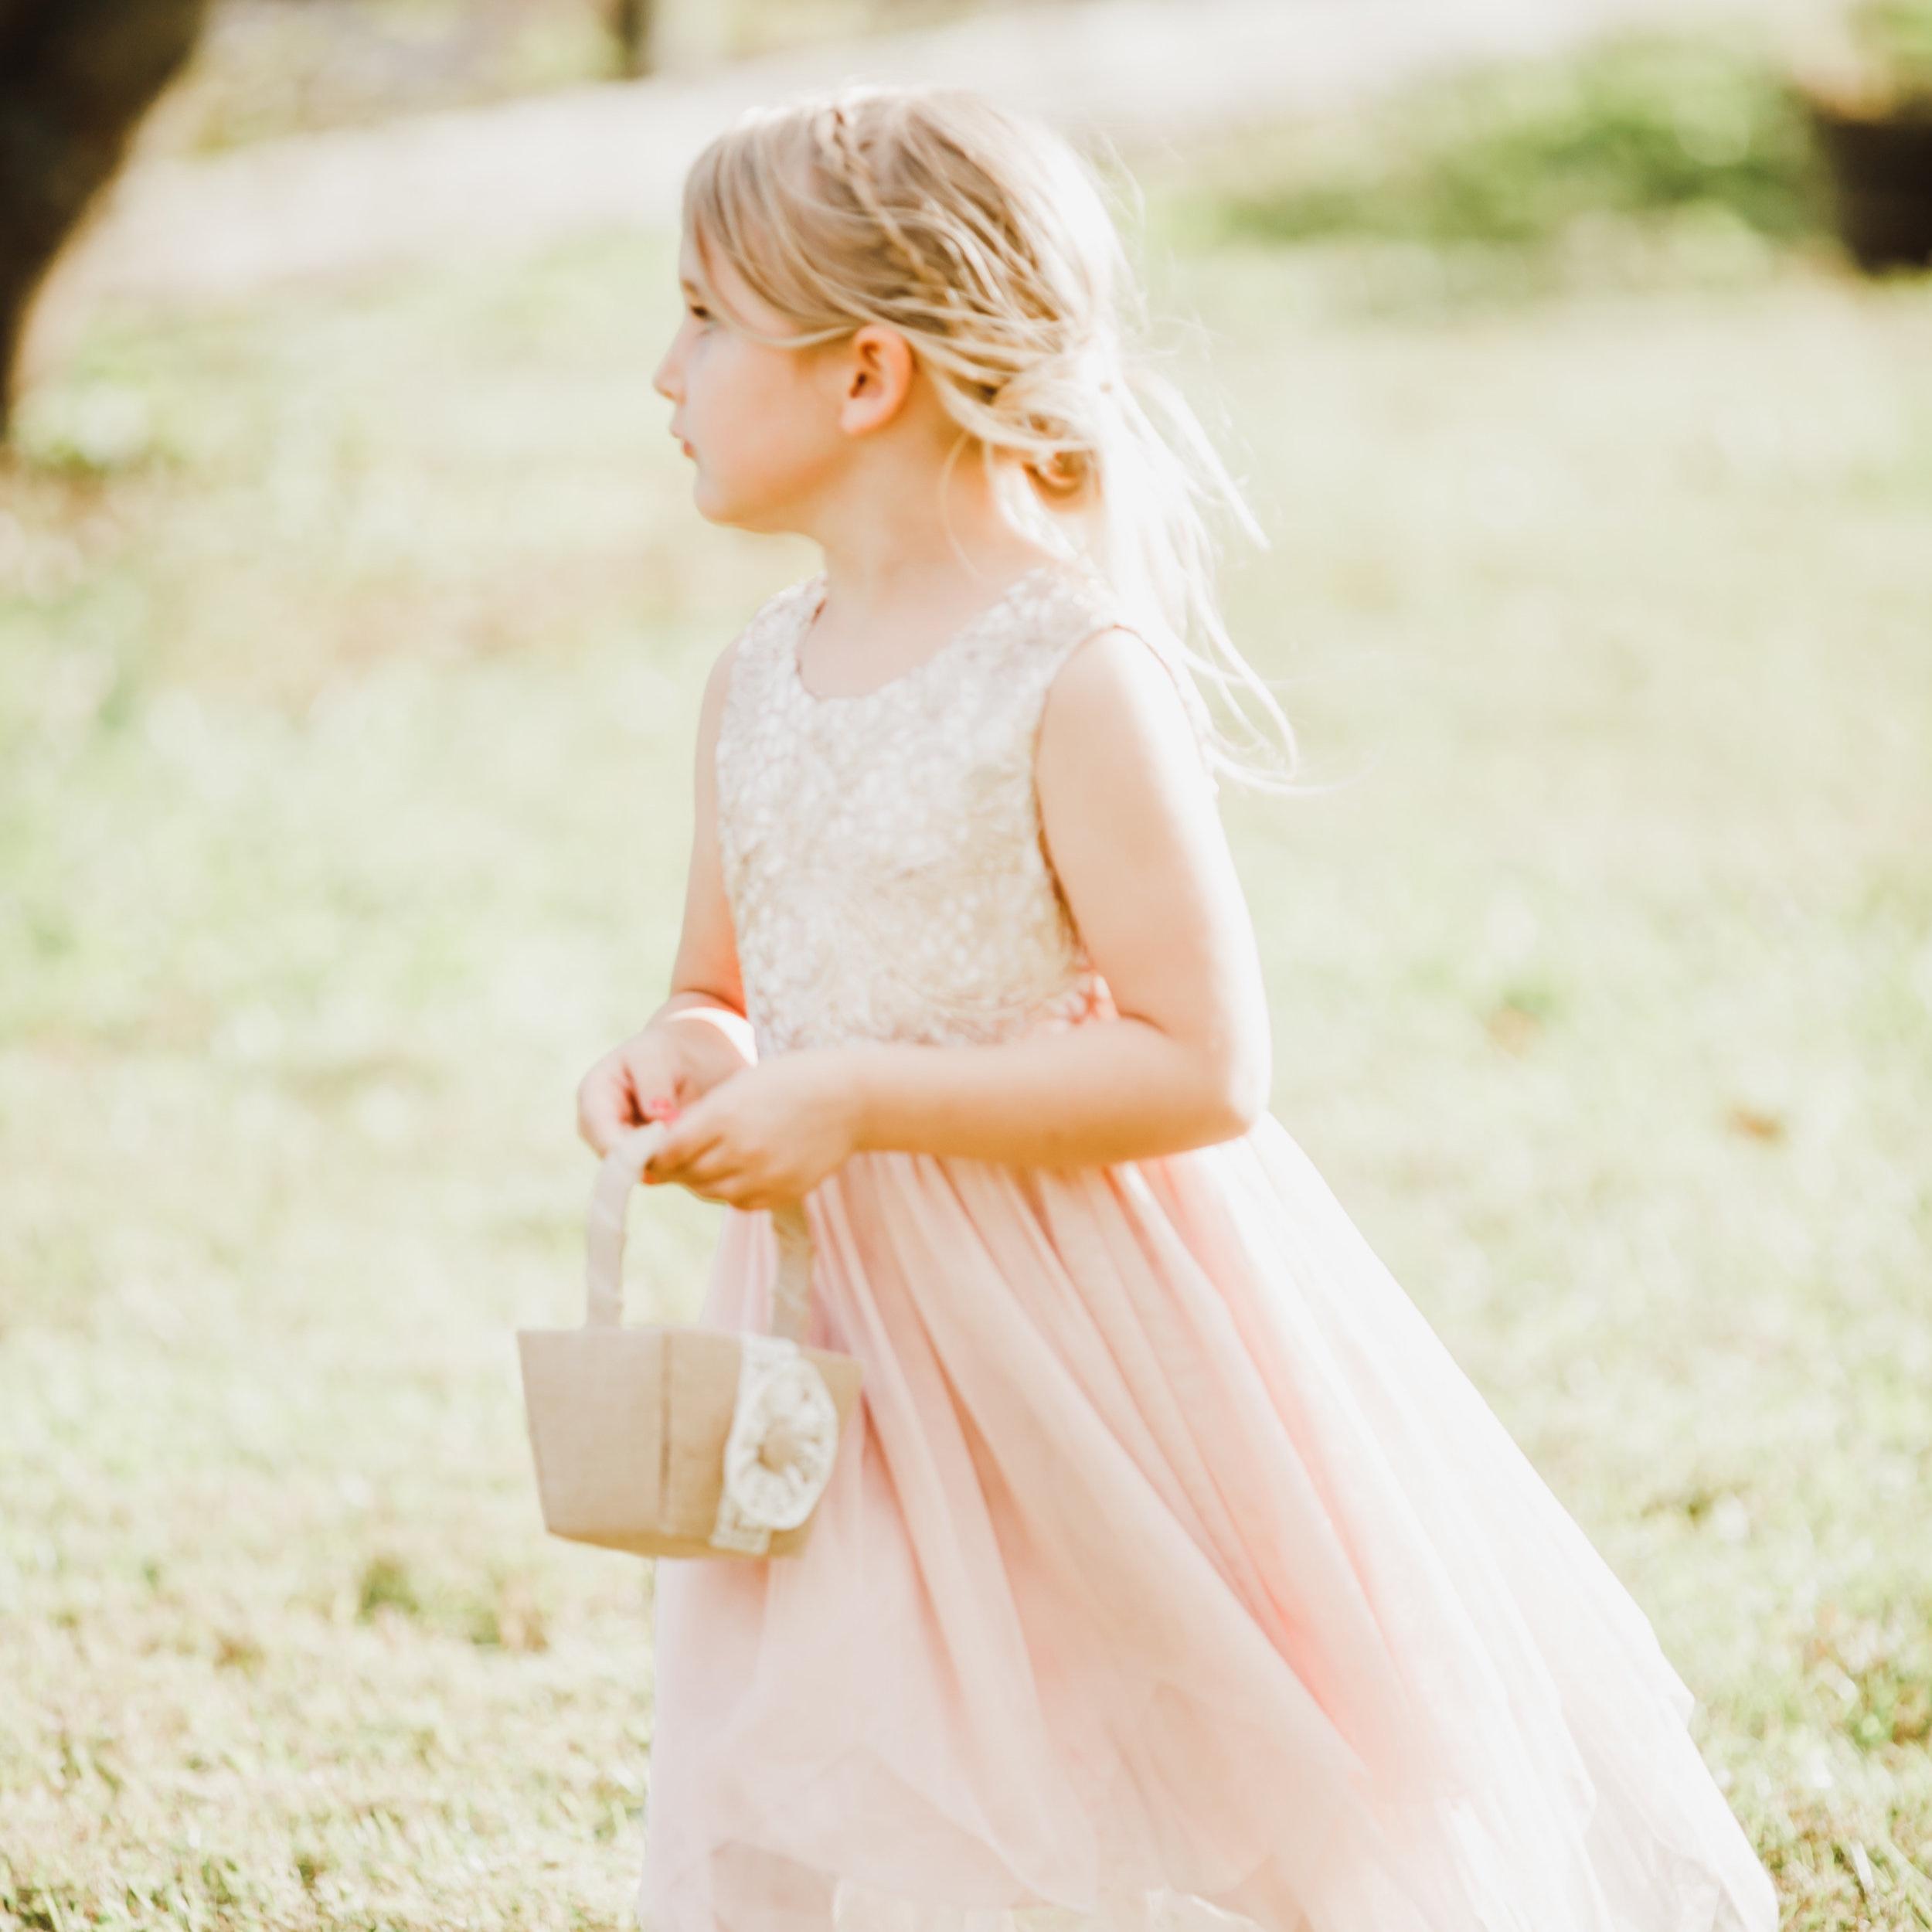 Fling - Virginia Wedding Photographer - Photography by Amy Nicole-248-12.jpg